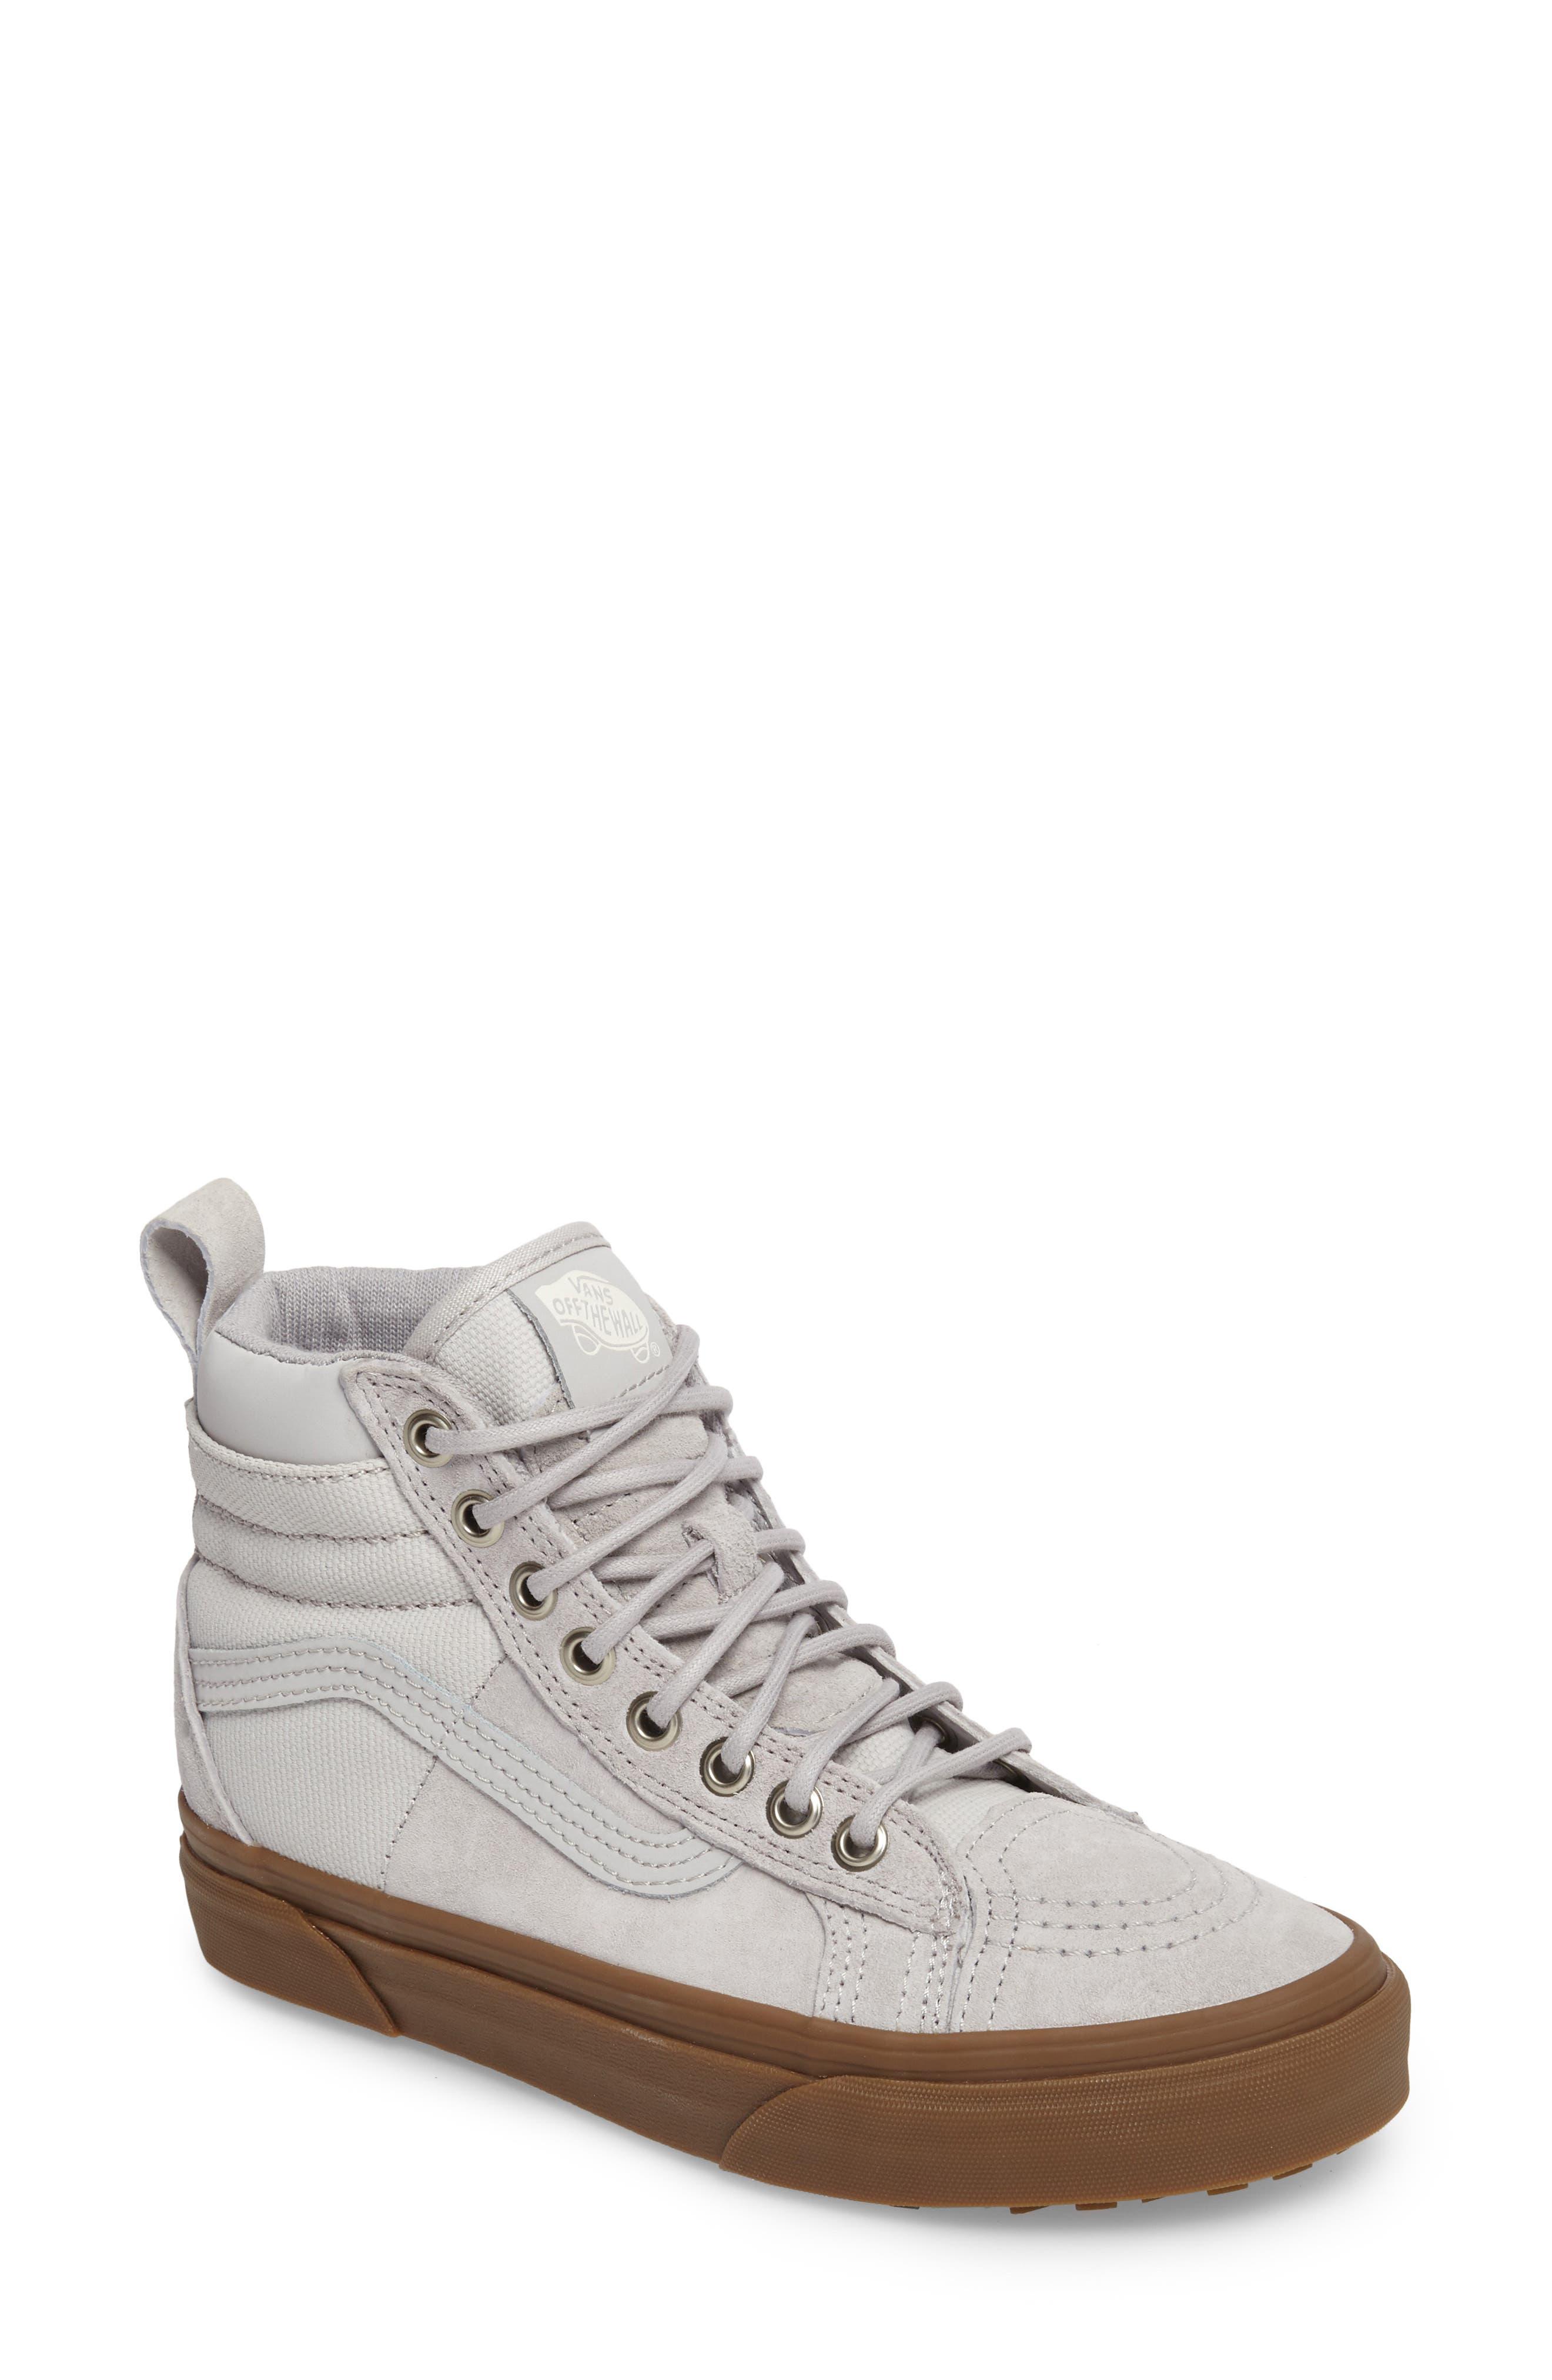 Sk8-Hi 46 MTE DX Sneaker,                         Main,                         color, 030